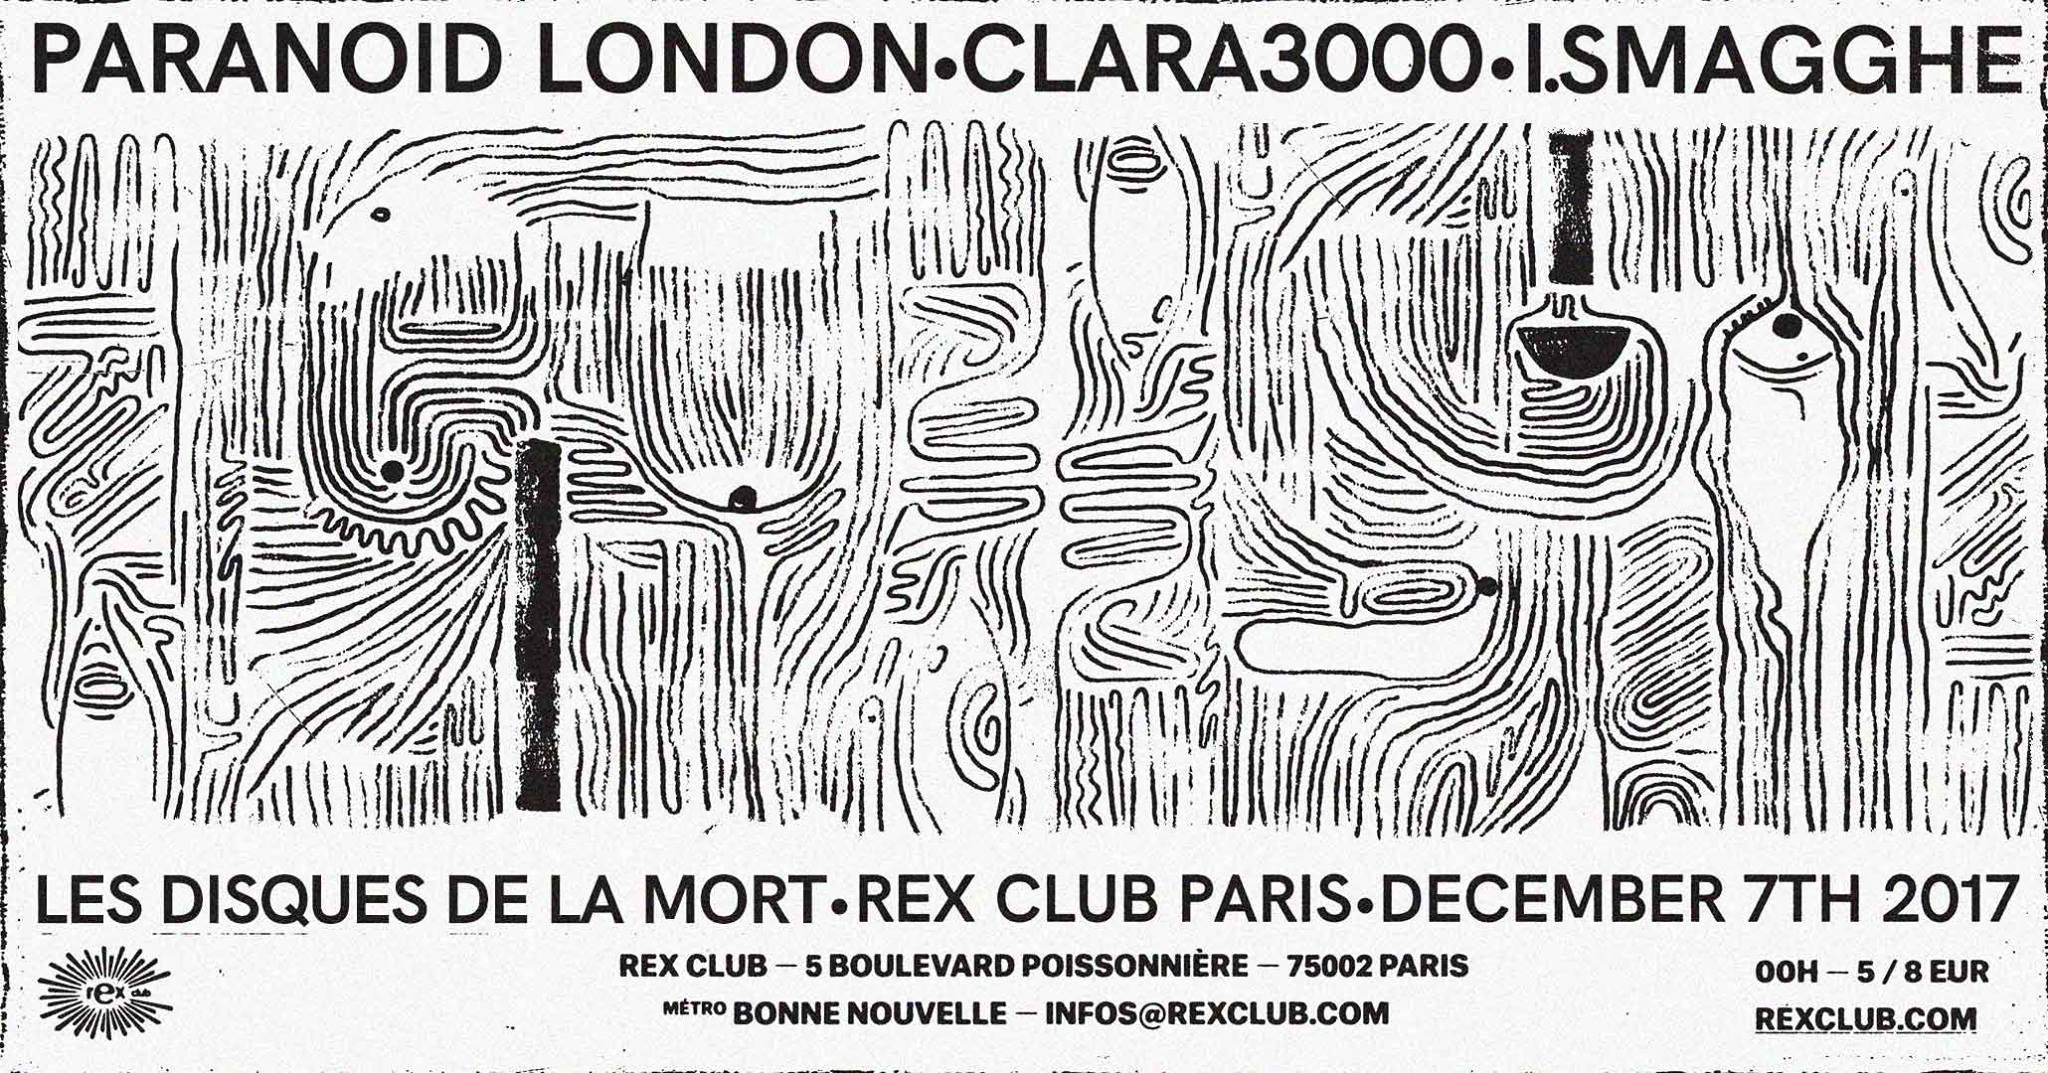 Lddlm: Paranoid London, Clara 3000, Ivan Smagghe